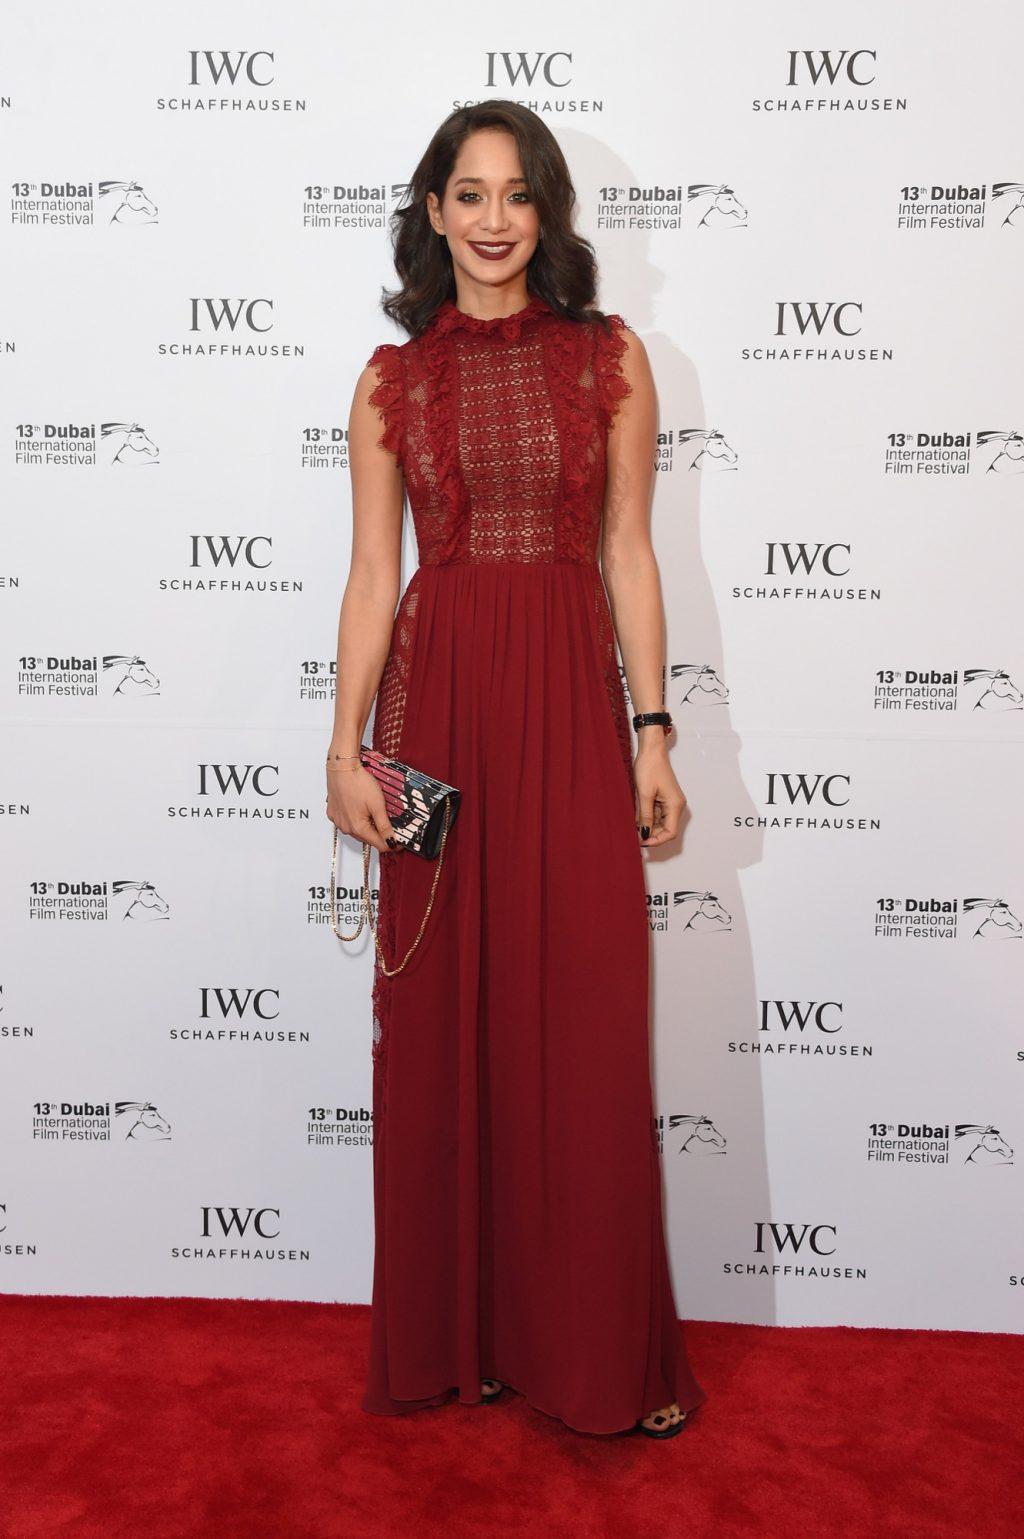 2fc08c2d6d085 فساتين رائعة ارتدتها النجمات في حفل جوائز IWC صوتي للأجمل - Savoir ...